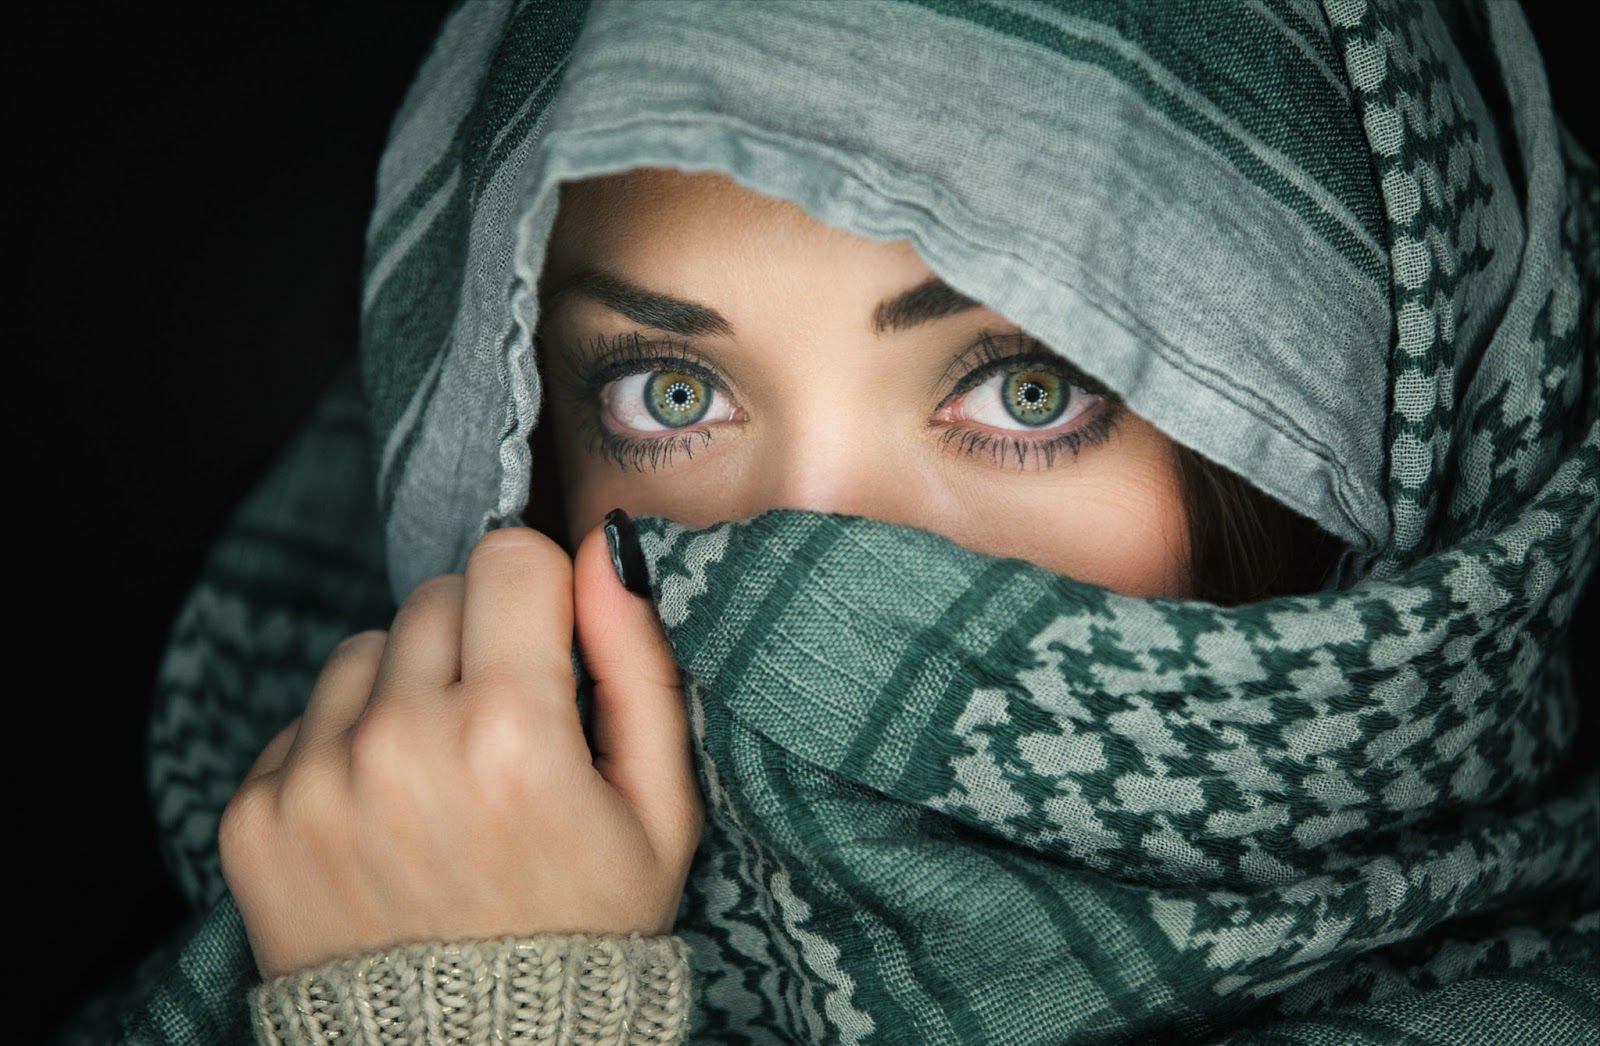 Gambar Wanita Muslimah Berhijab Cantik Pojok 41 Wanita